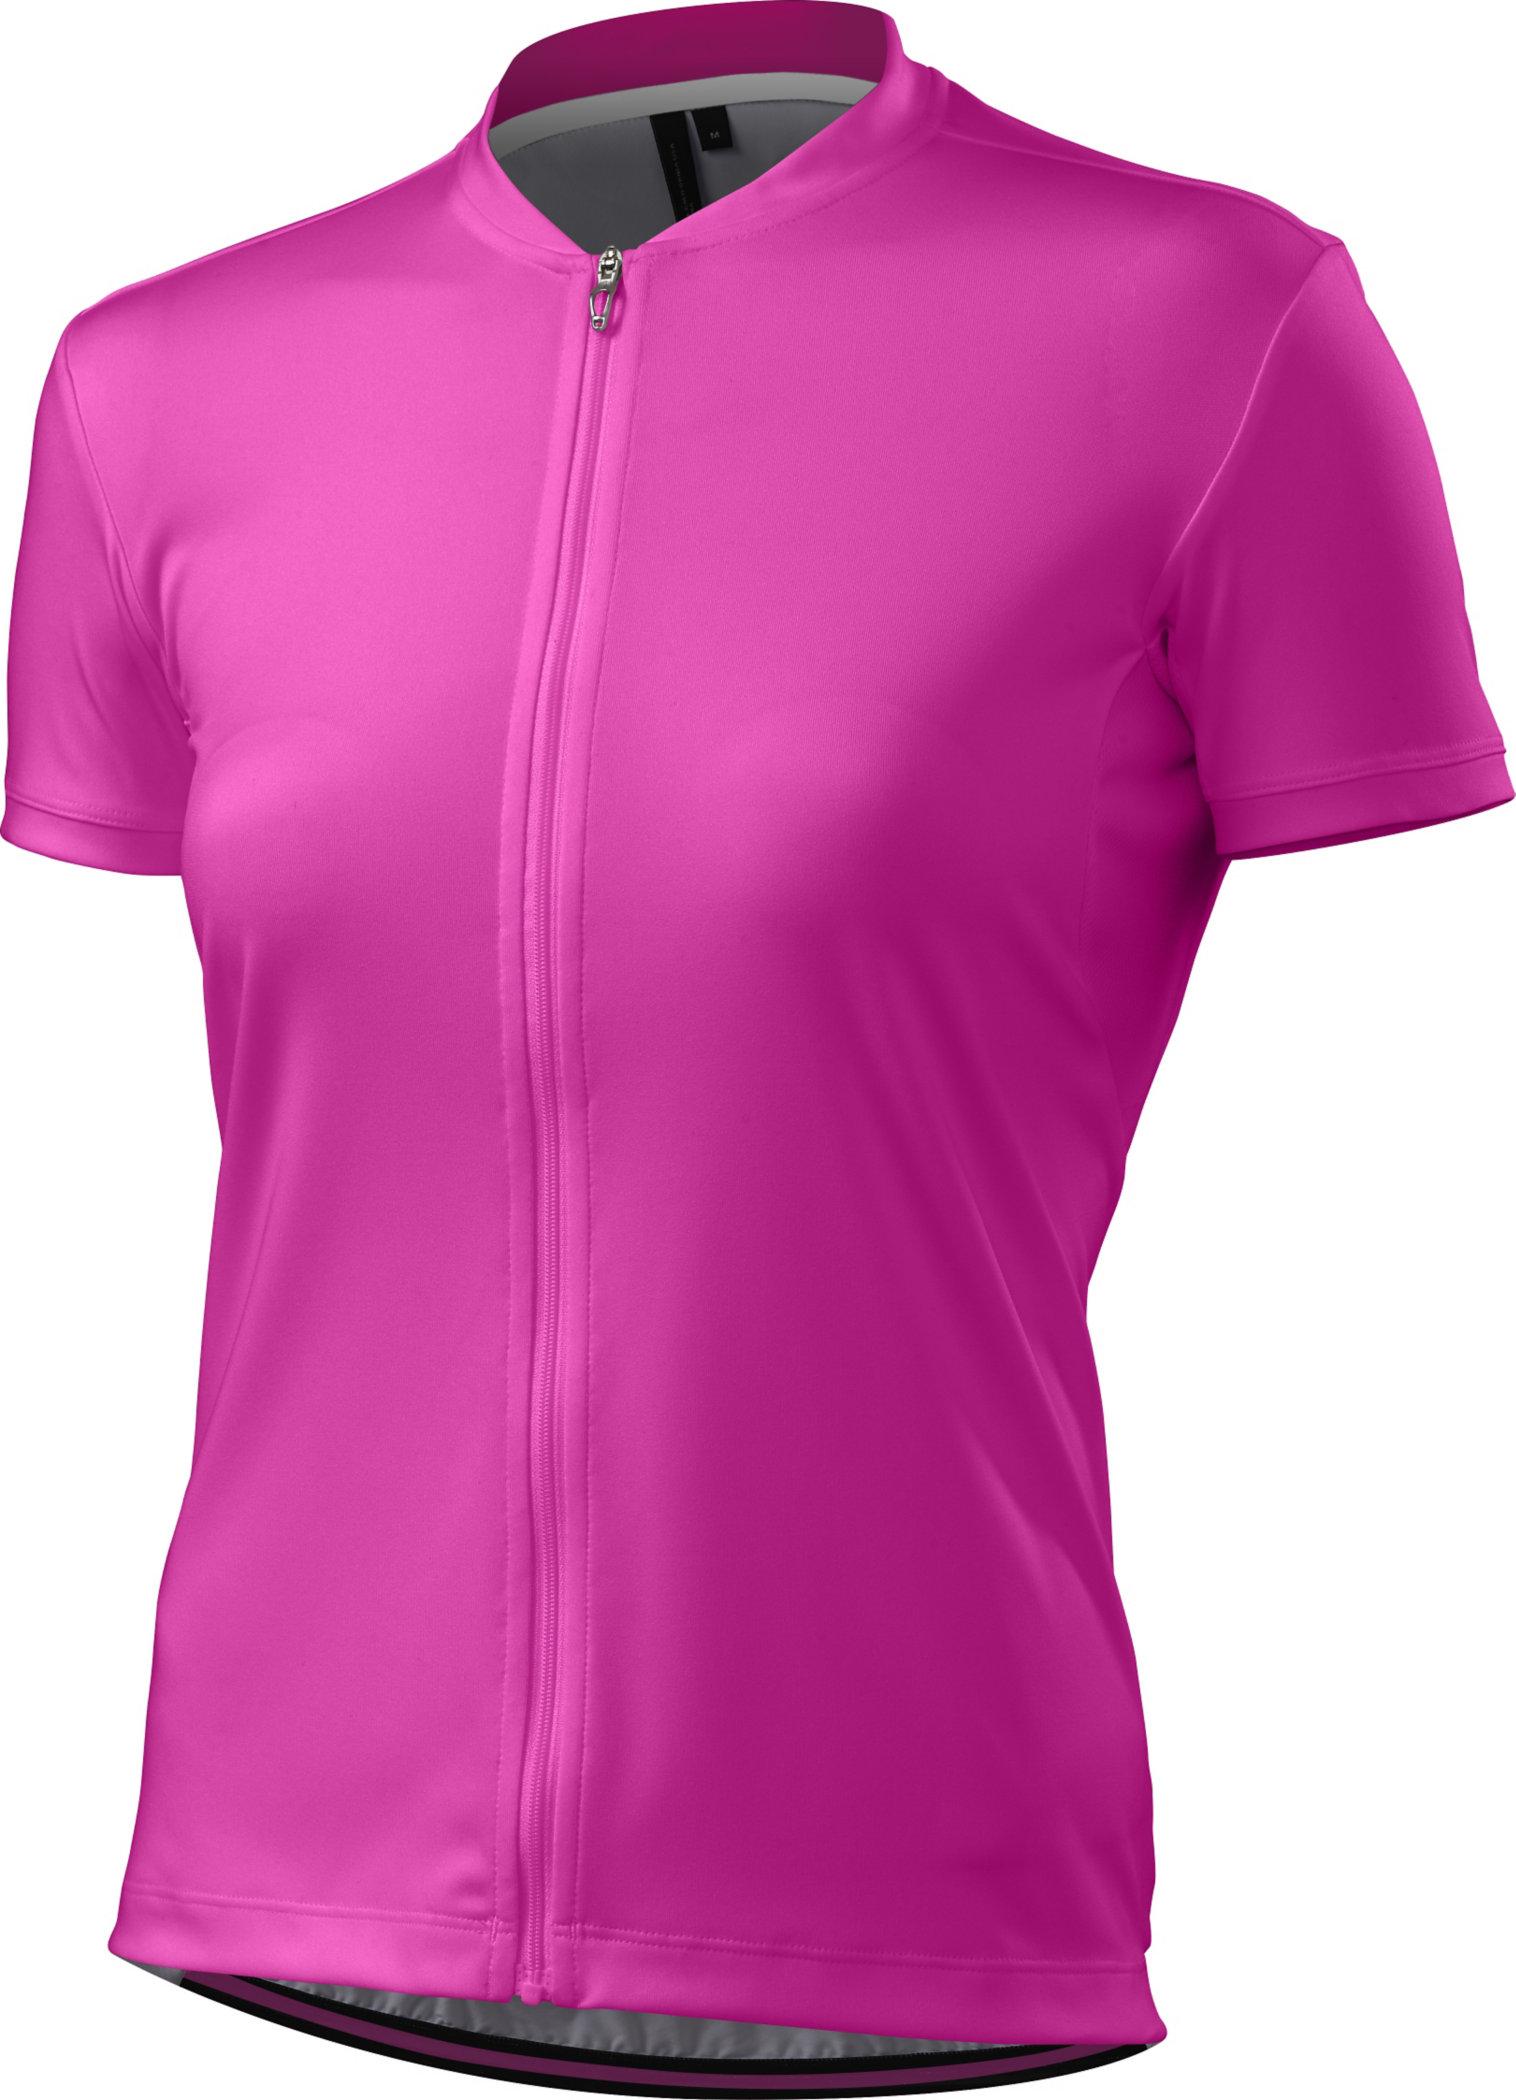 Specialized Women´s RBX Sport Jersey Neon Pink Medium - Alpha Bikes